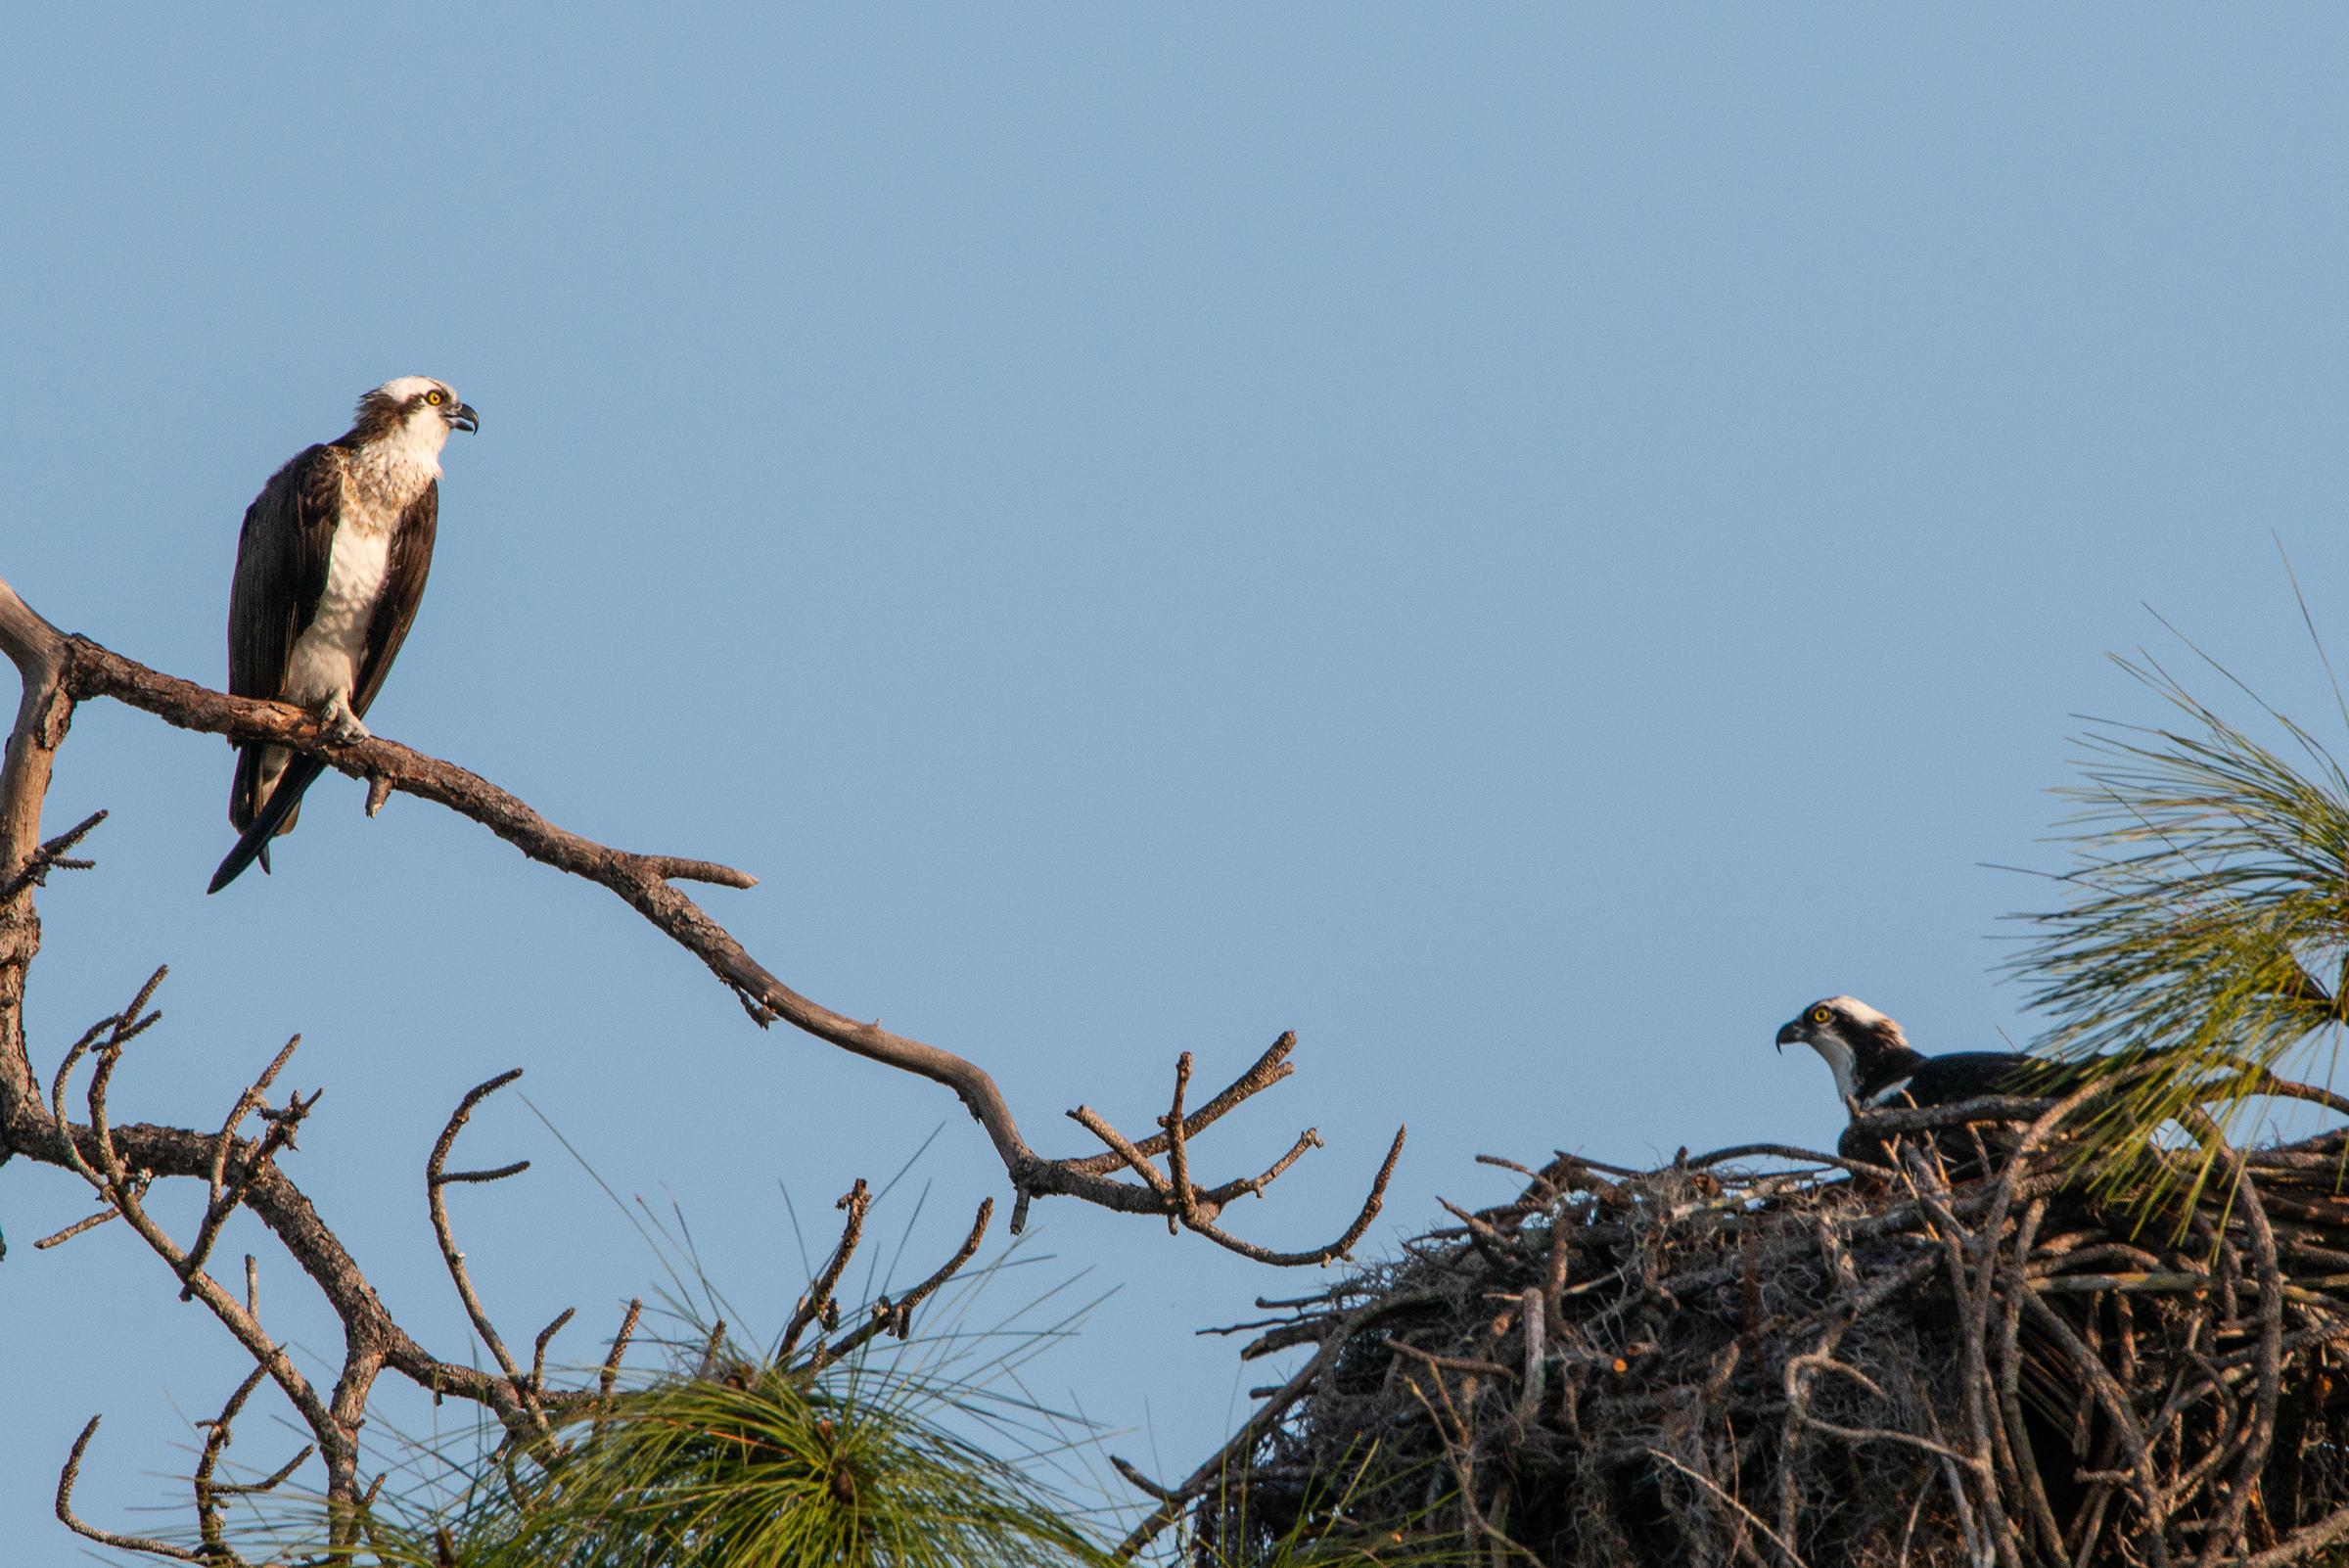 #osprey, #mating, #nest, #tamronlens, #nikond800